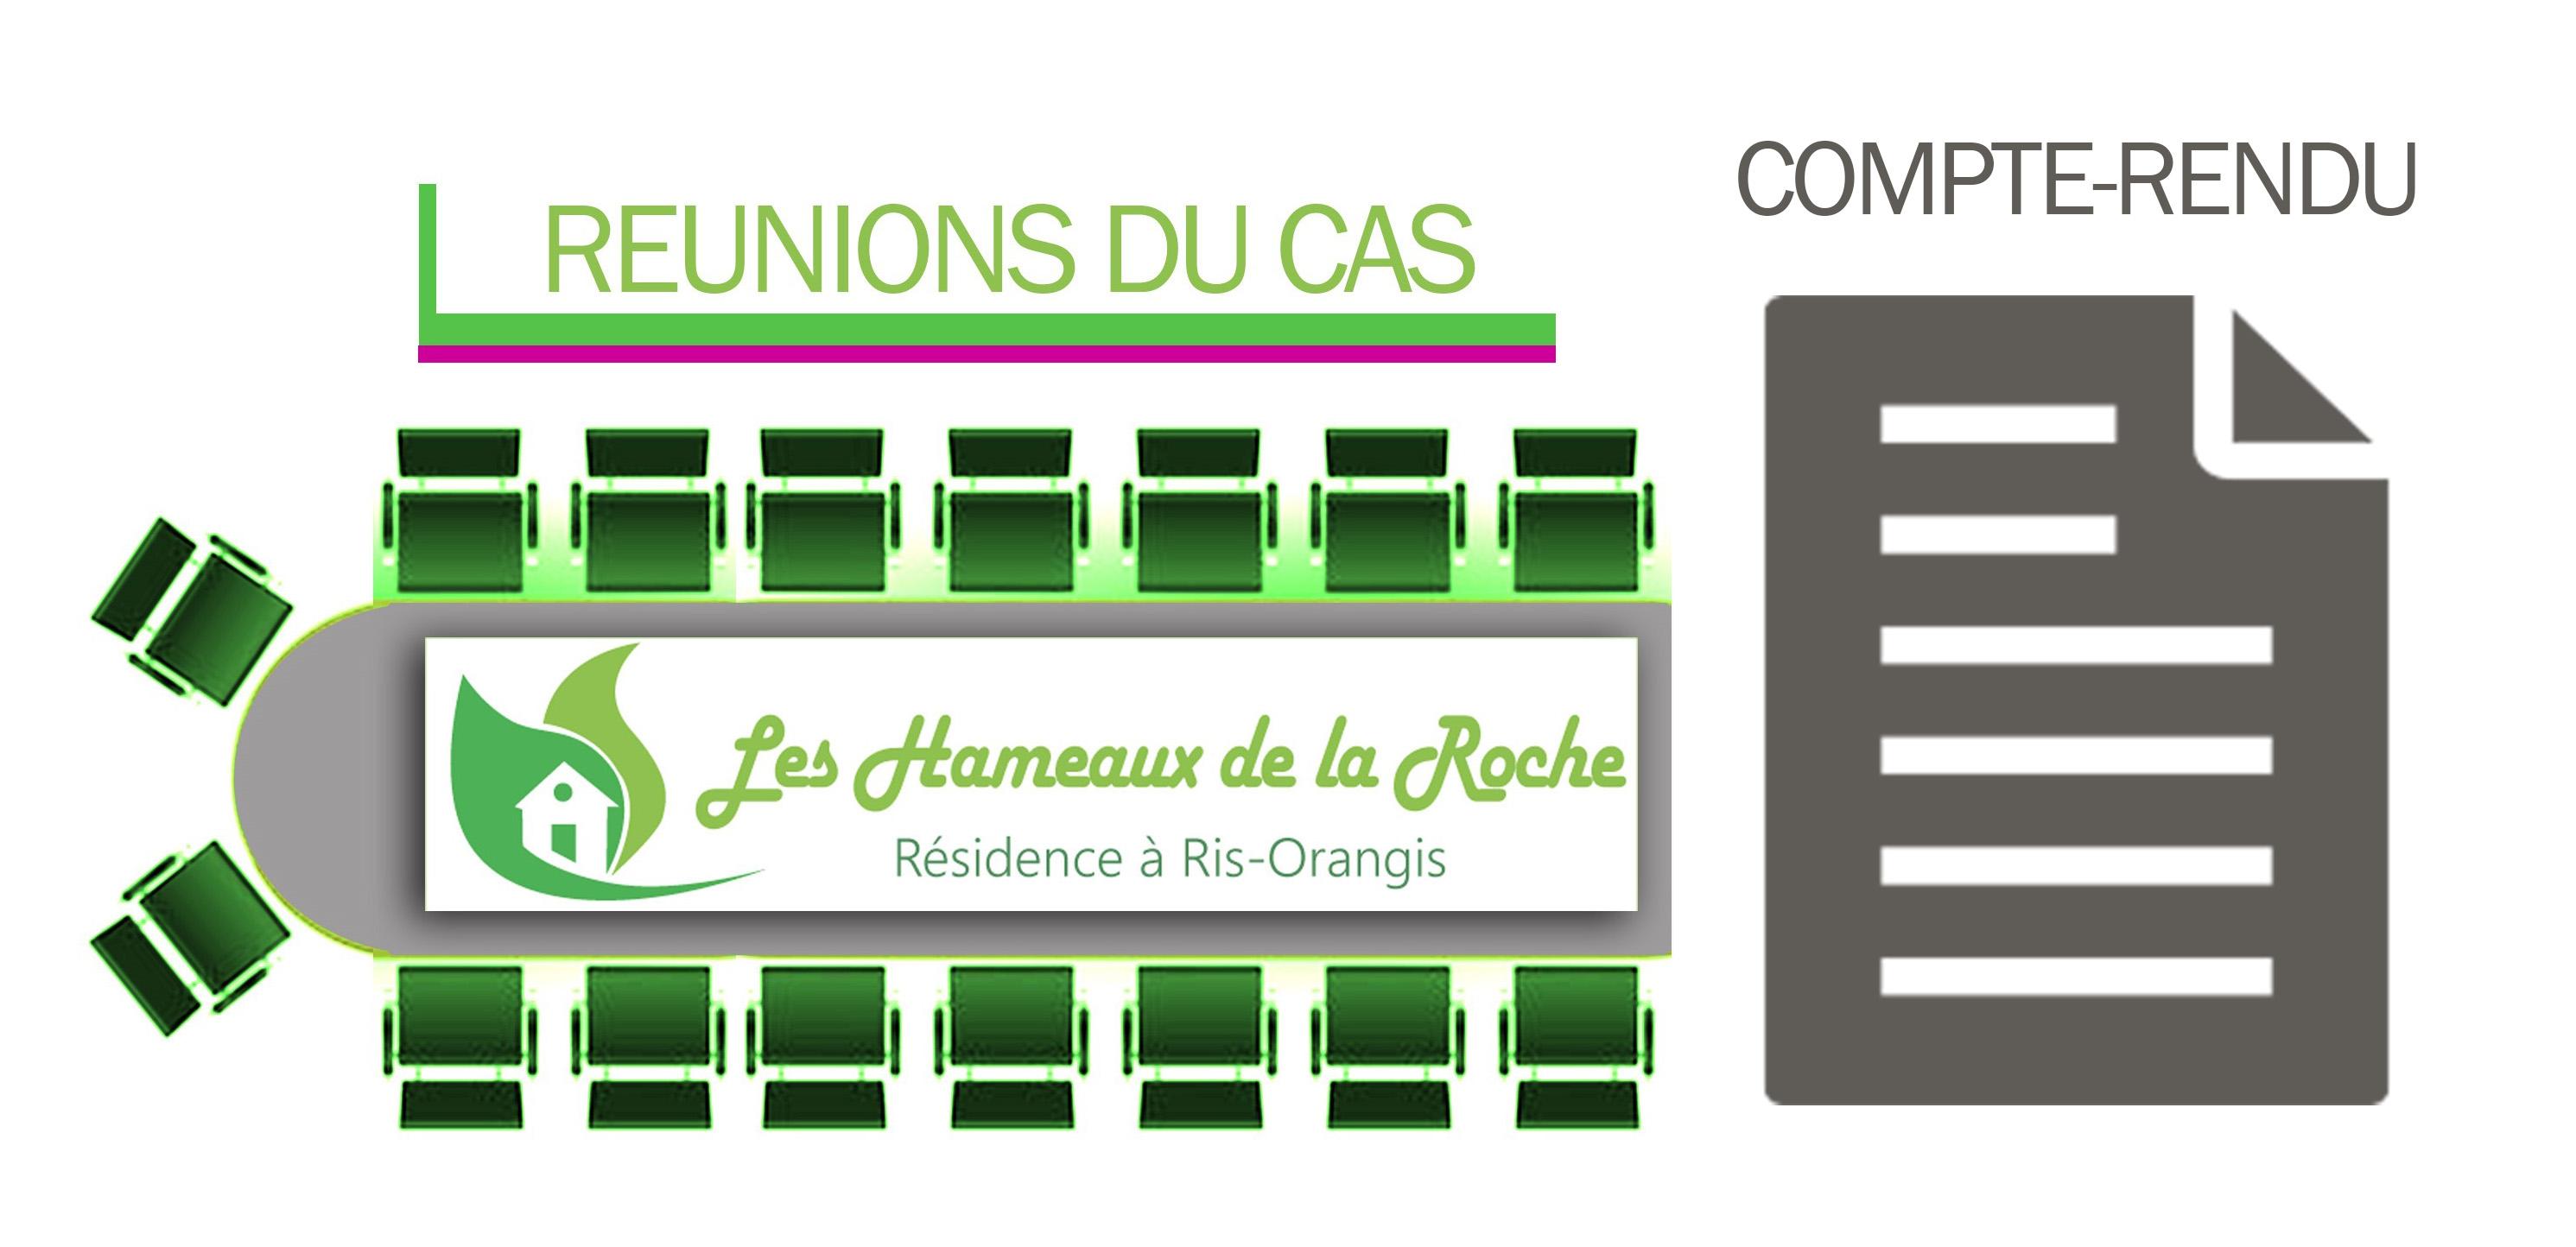 Compte-rendu-reunion-CASavec-logo